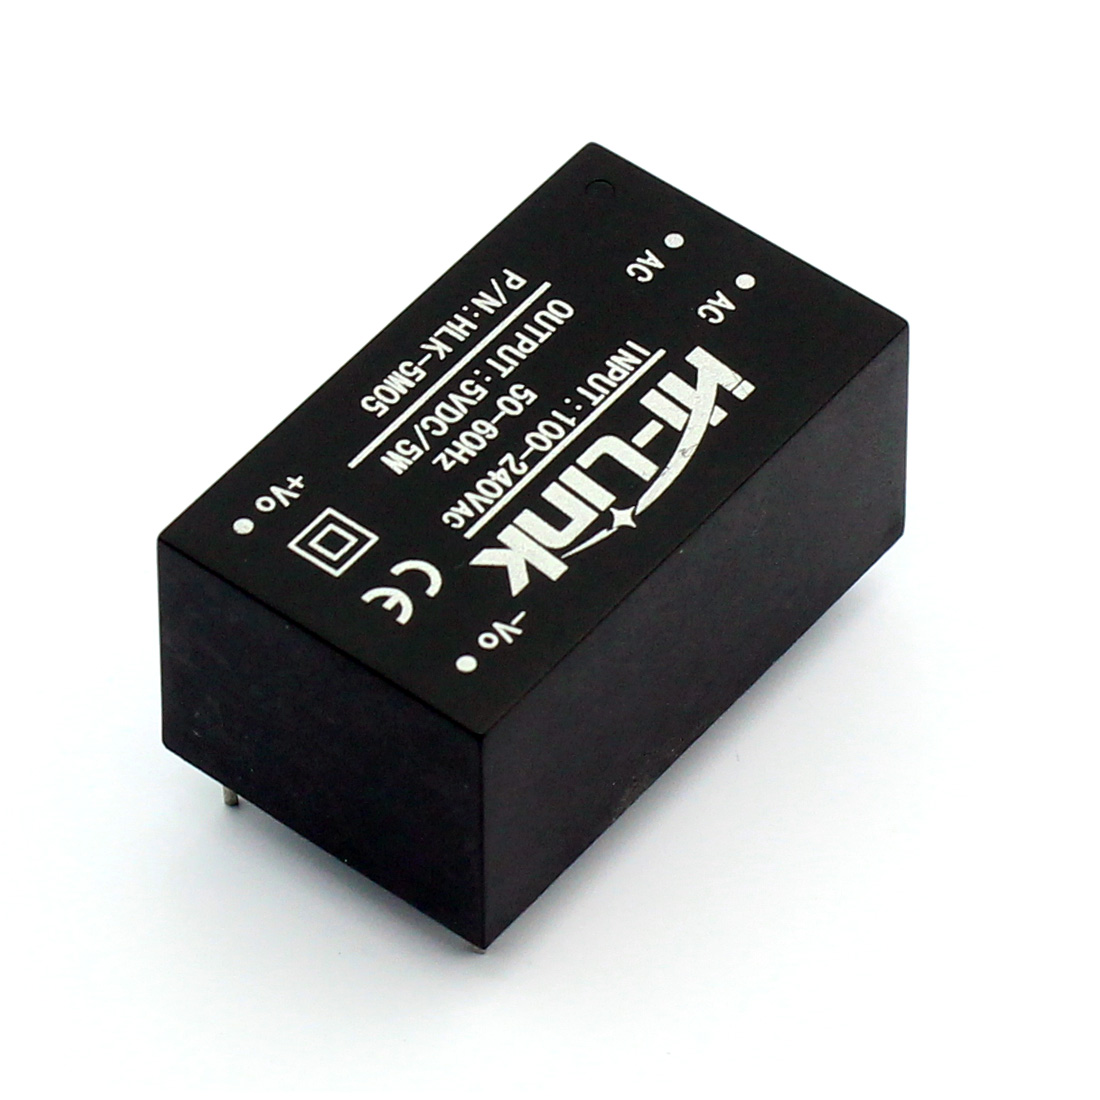 High Quality HLK-5M05 AC DC 220V to 5V 5W 5Watt Isolated Switching Step-Down Power Supply Module Converter HLK 5M05 5pcs white case 90 240v 110 220v ac to 12v step down dc converter led switching power supply module 5w 450ma